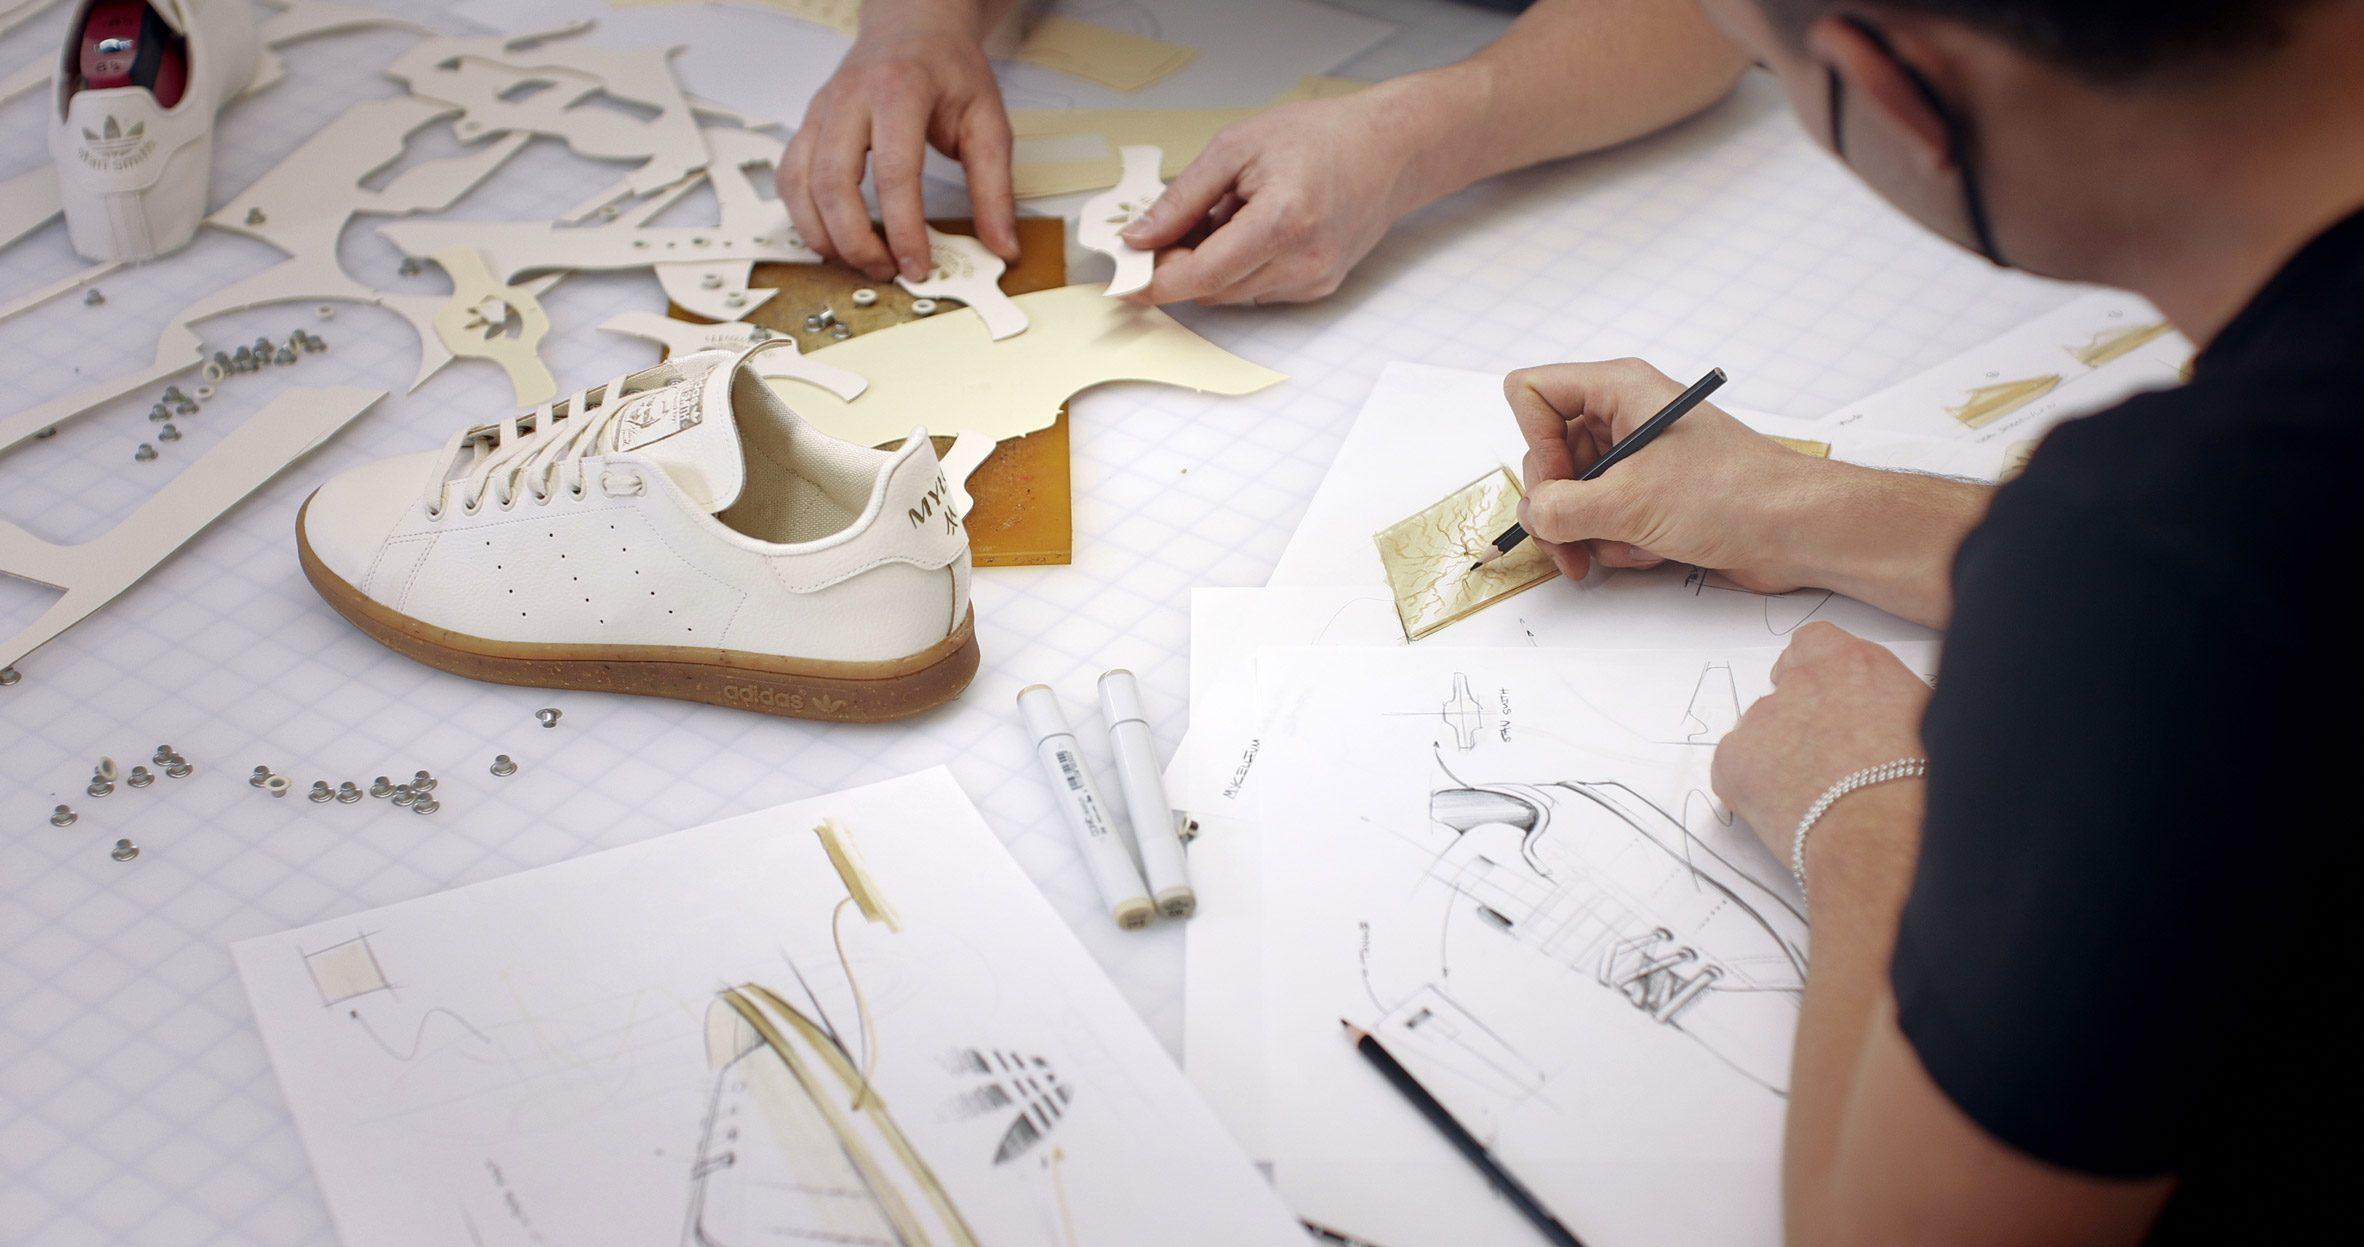 Stan Smith Mylo mushroom mycelium vegan leather shoes being designed